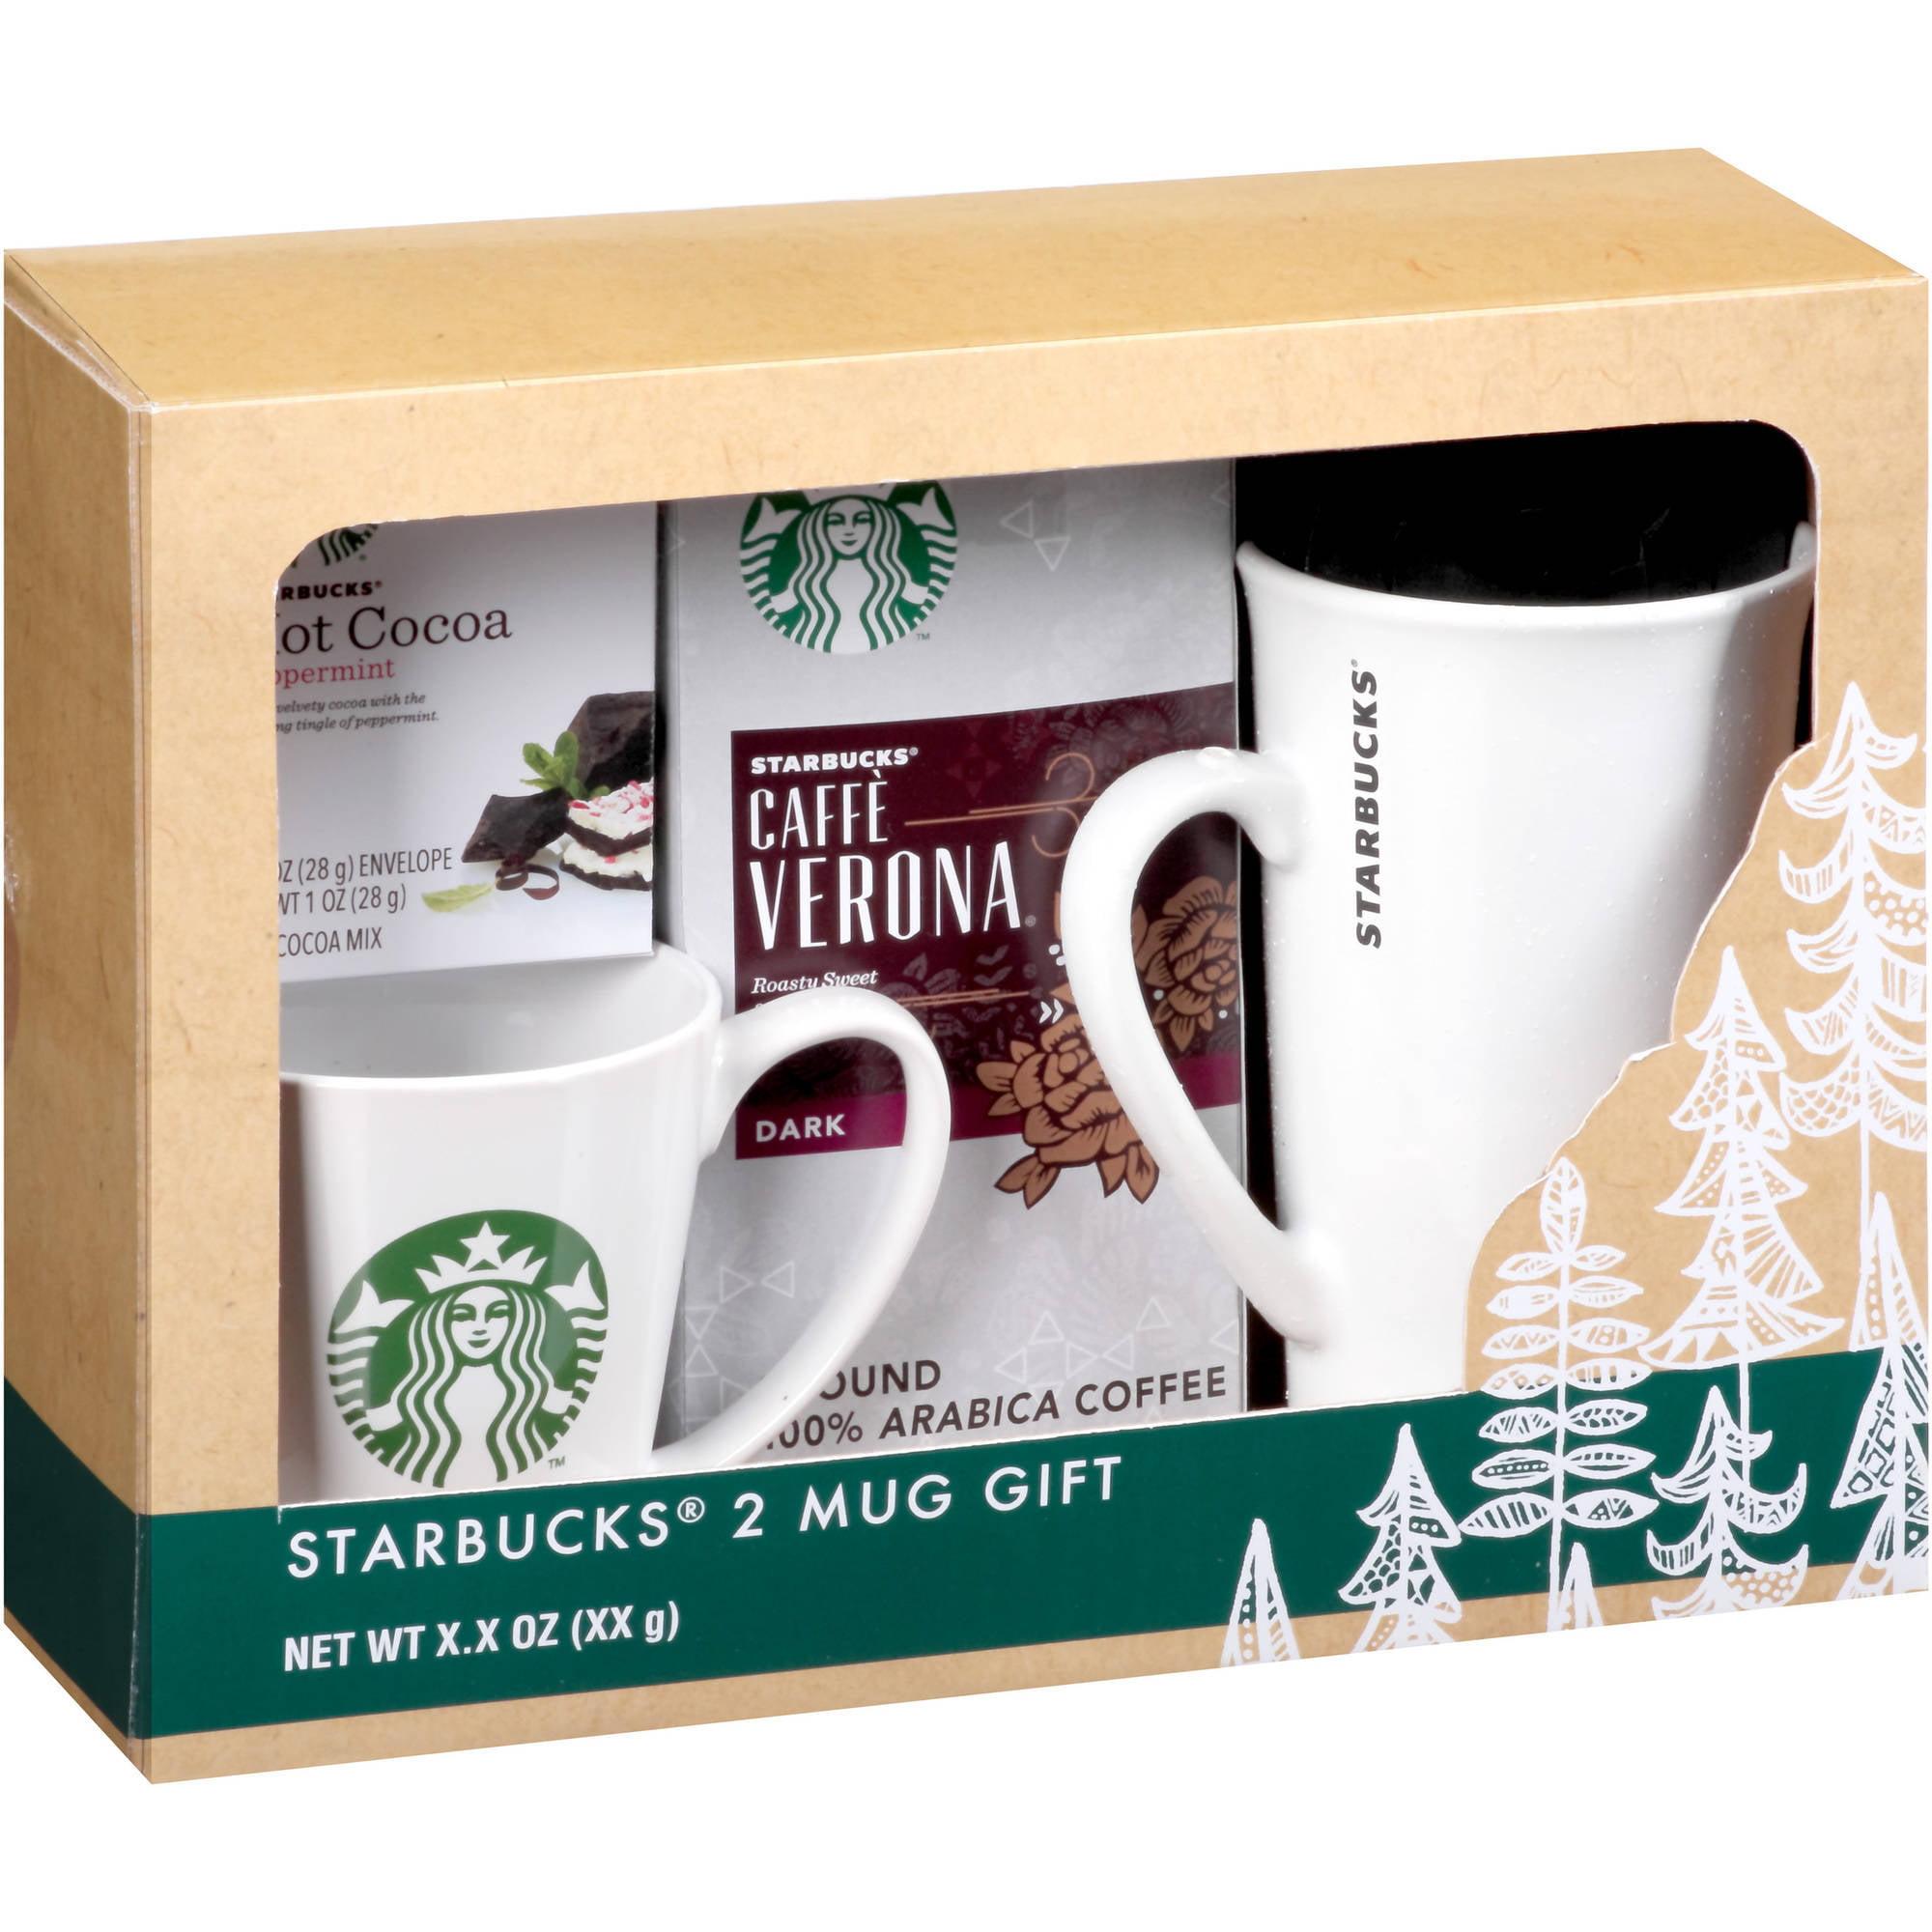 Thomas kinkade tea mug holiday gift set pc walmart